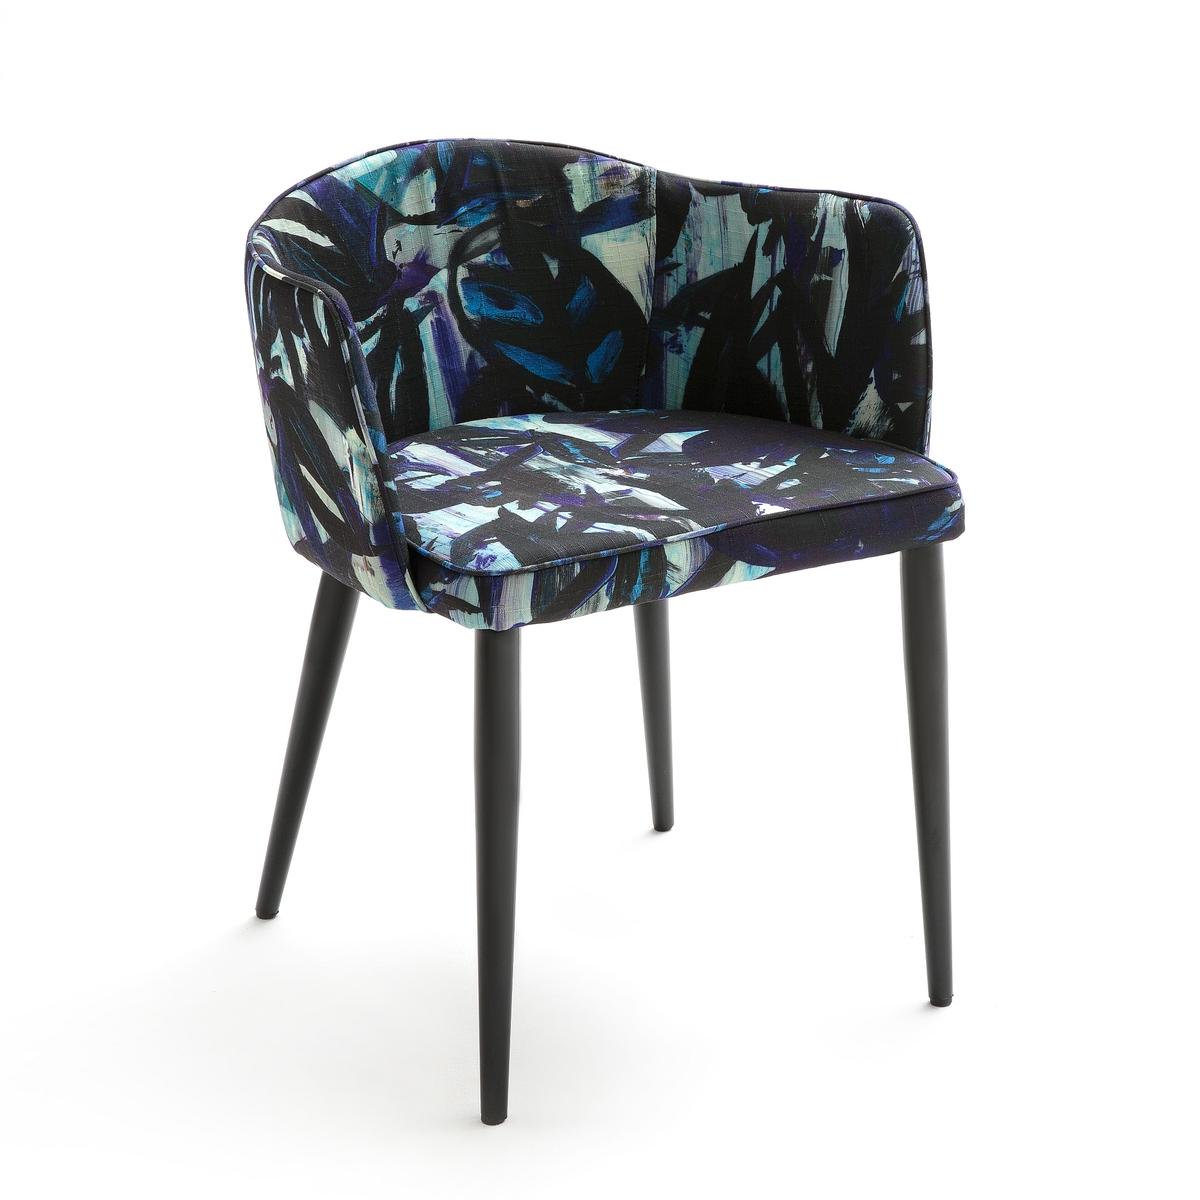 Кресло с рисунком джунгли, Bristol